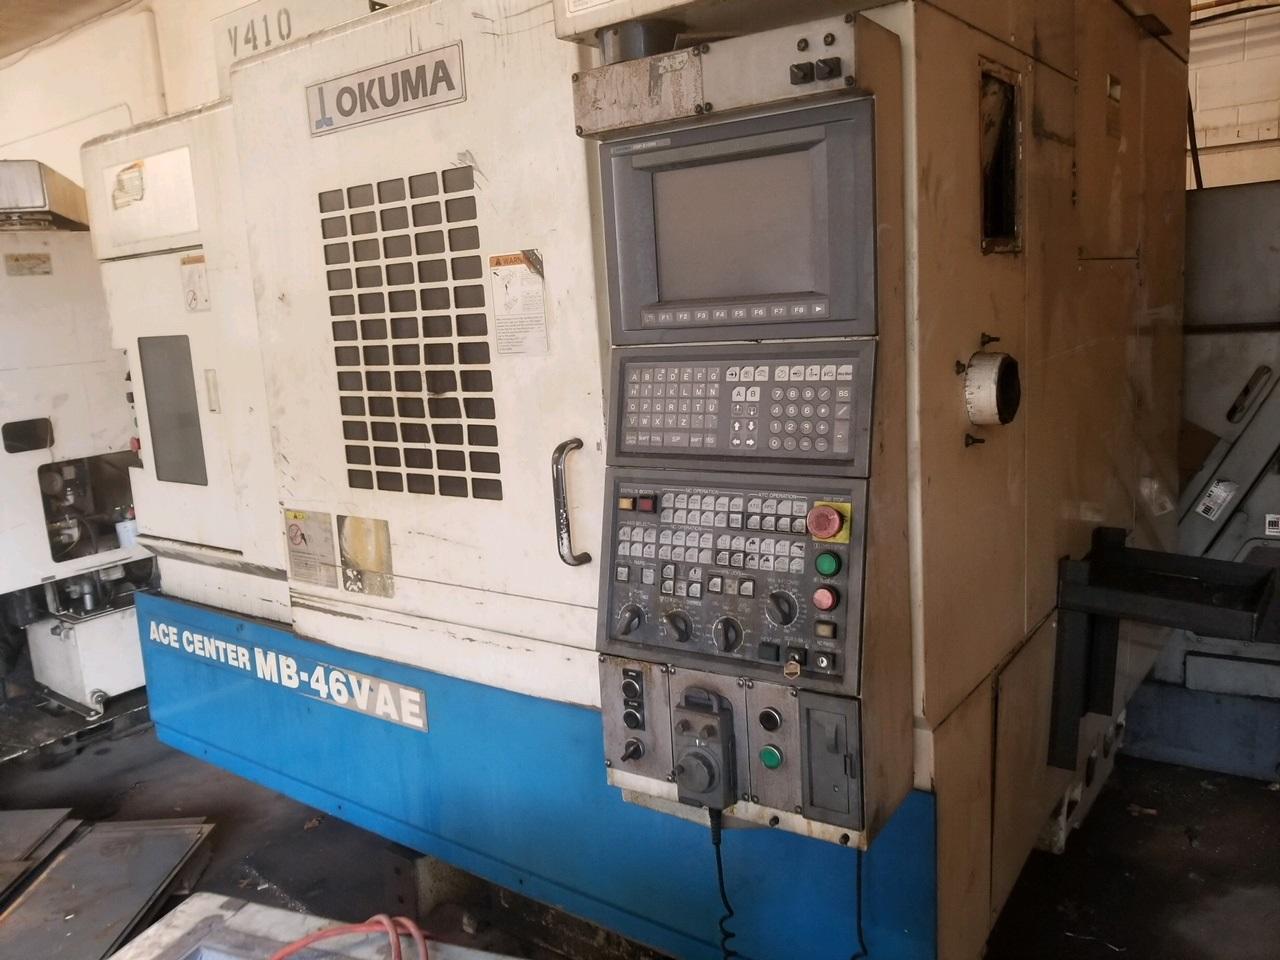 Okuma MB-46 VAE CNC VERTICAL MACHINING CENTER - Fabricating